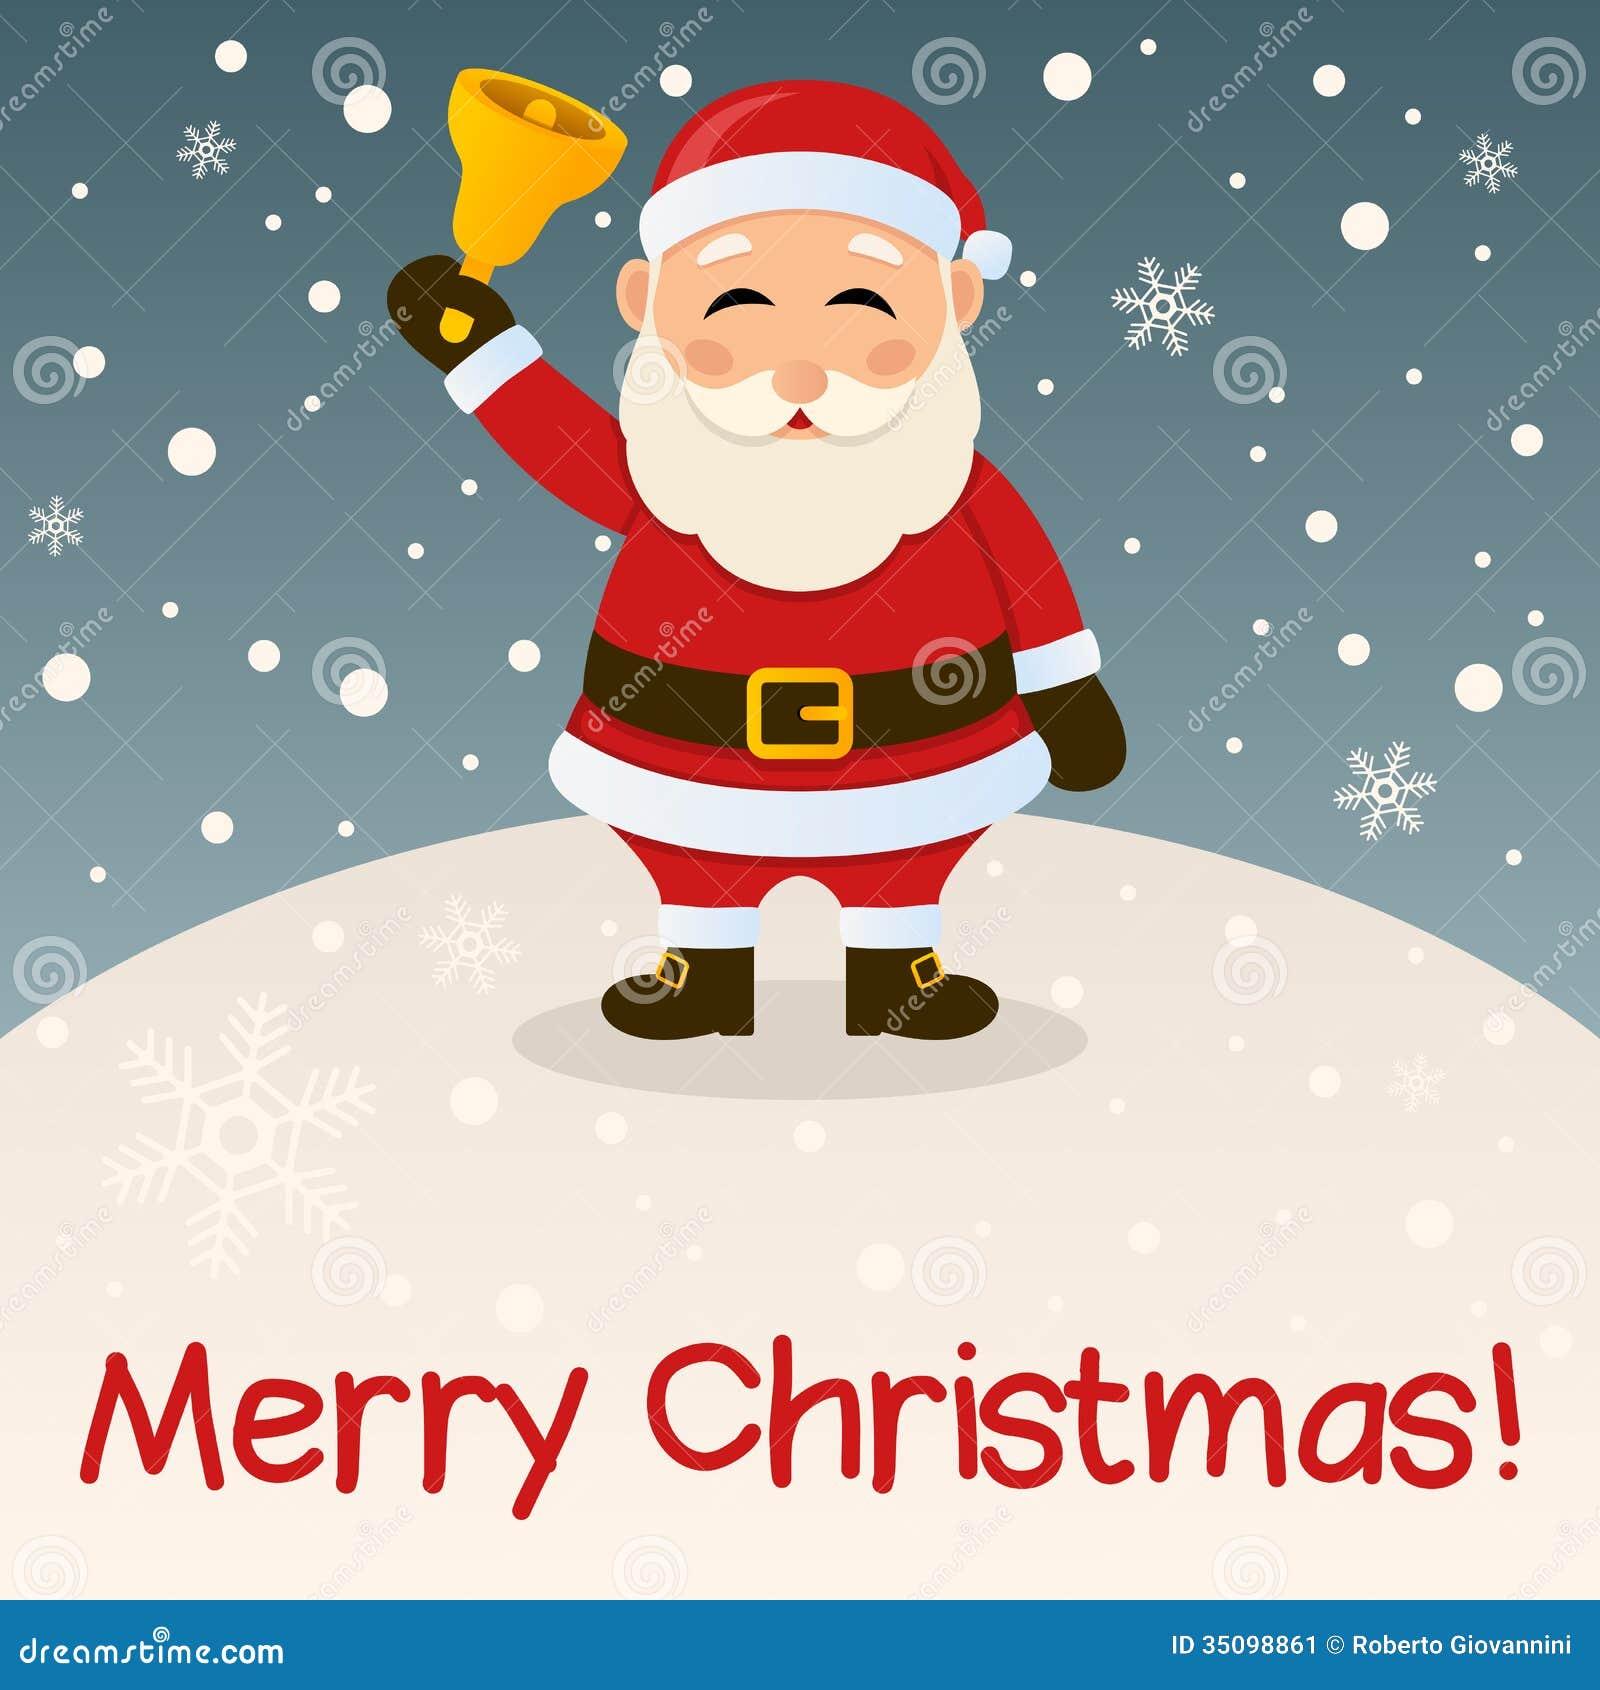 Santa Claus Merry Christmas Card